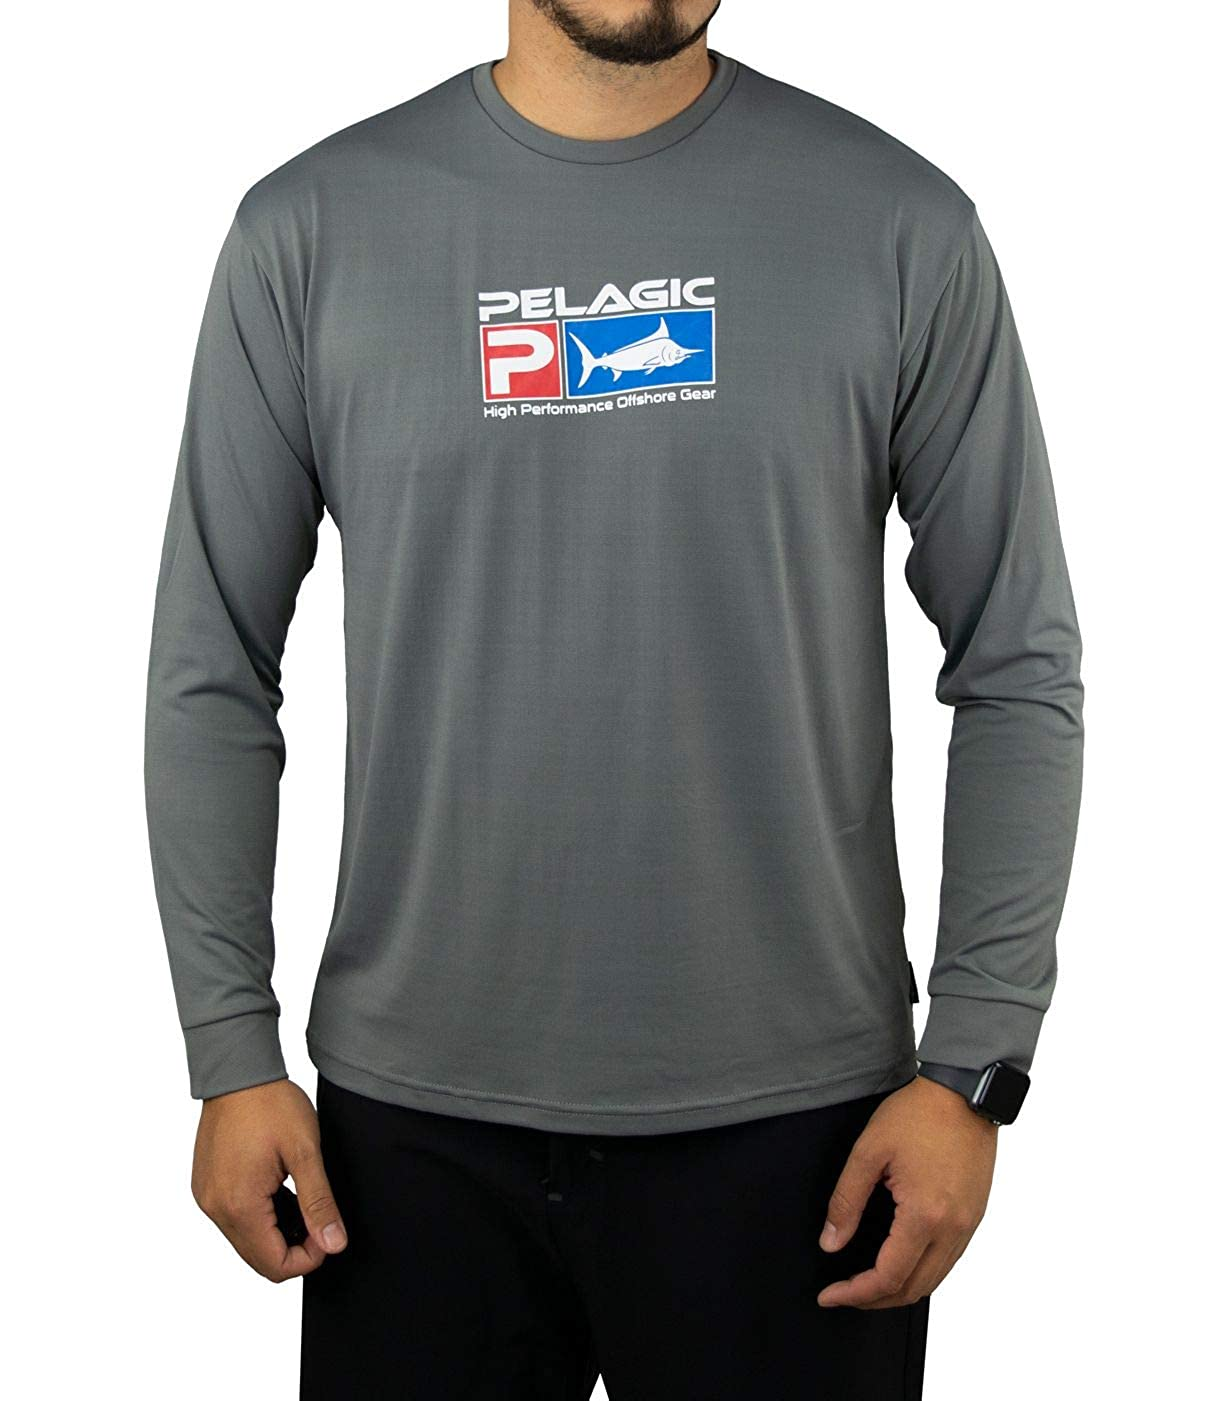 b55db630 Pelagic Men's Aquatek Long Sleeve Fishing Shirt | UV 50+ Sun Protection  Charcoal at Amazon Men's Clothing store: